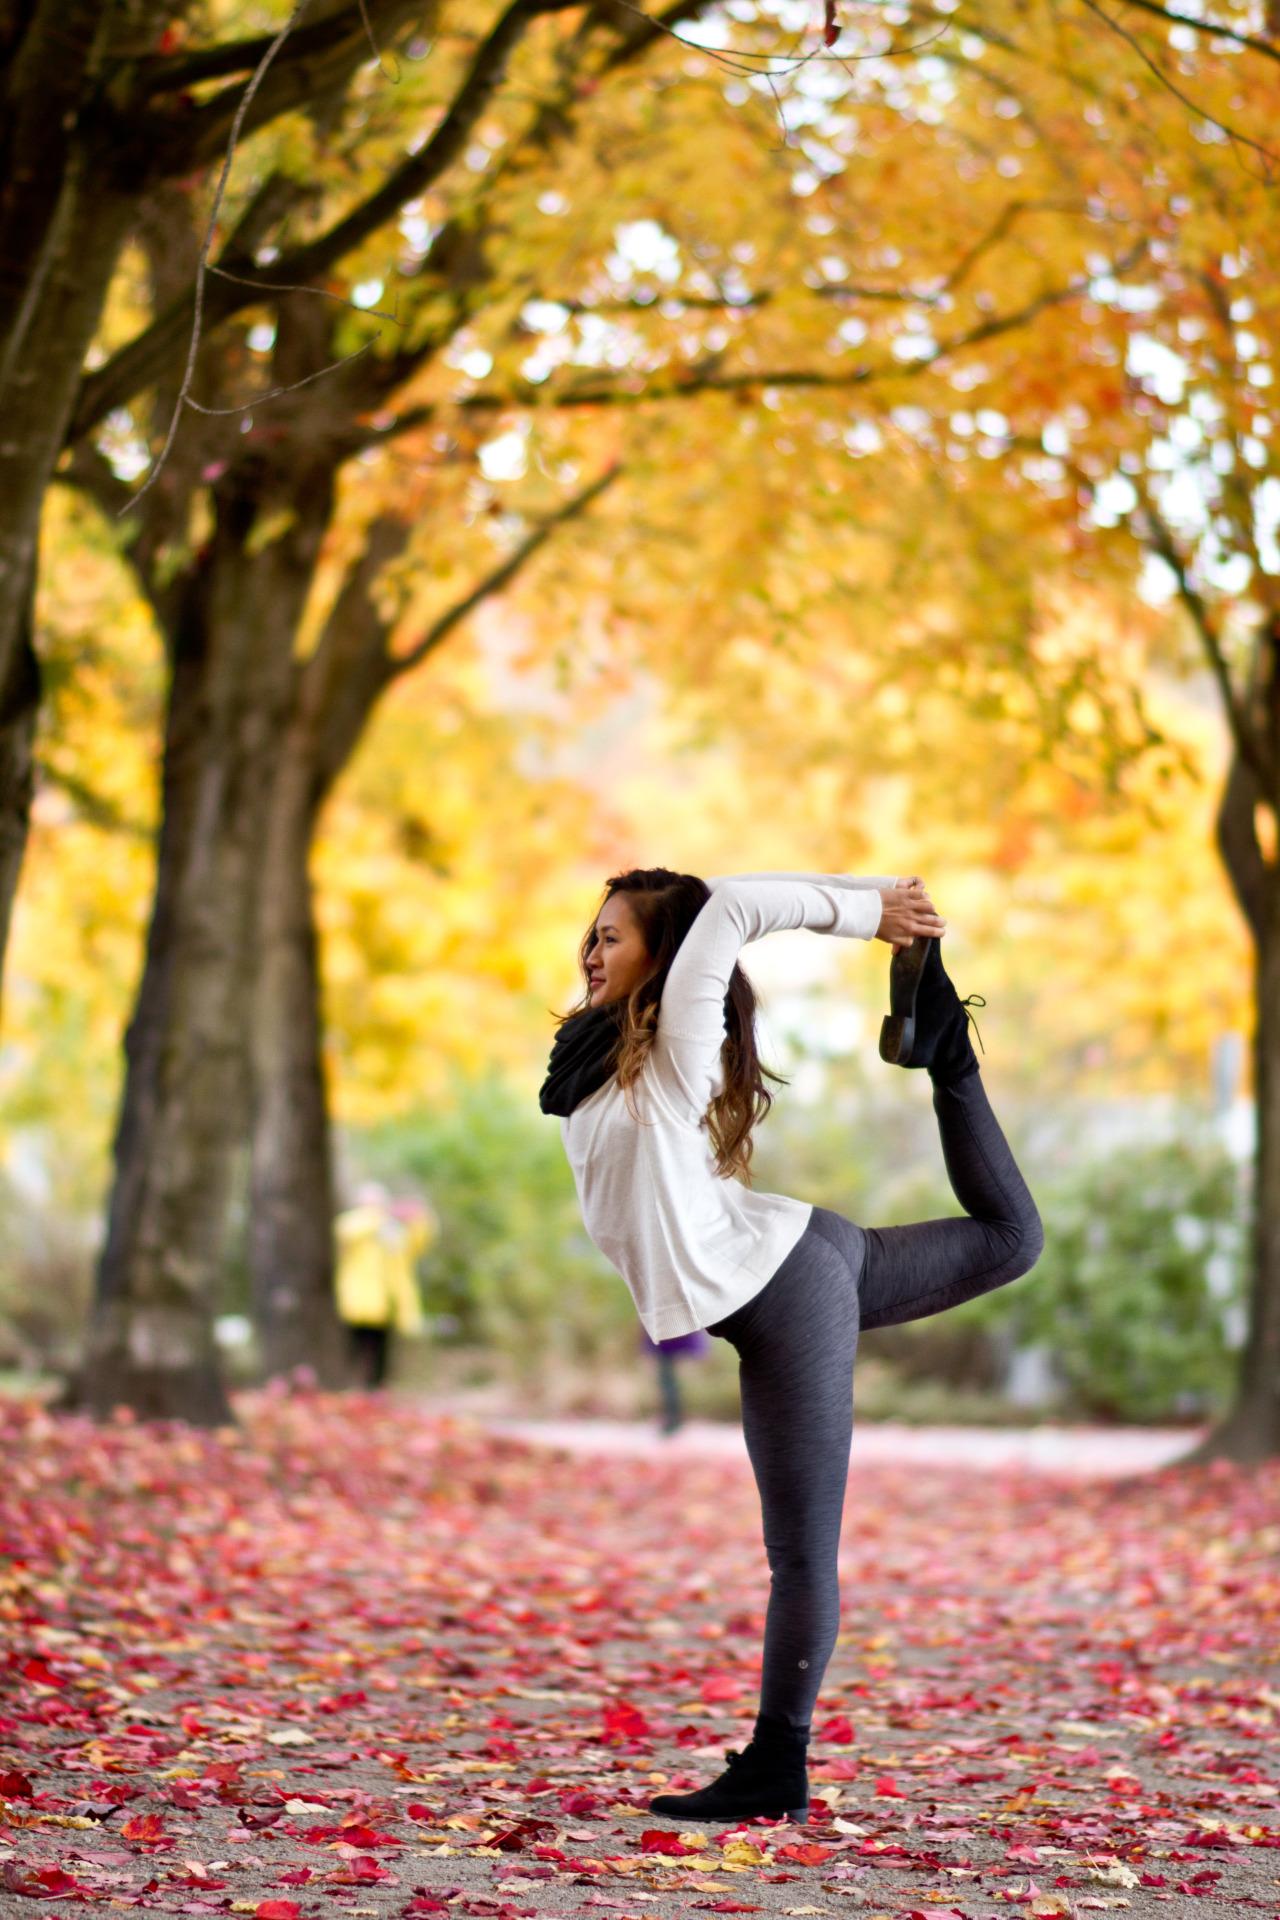 Breathtaking Fall Foliage  Natarajasana | Dancer's Pose Trout Lake | Vancouver | British Columbia | Canada    Facebook.com/CamLeeYoga